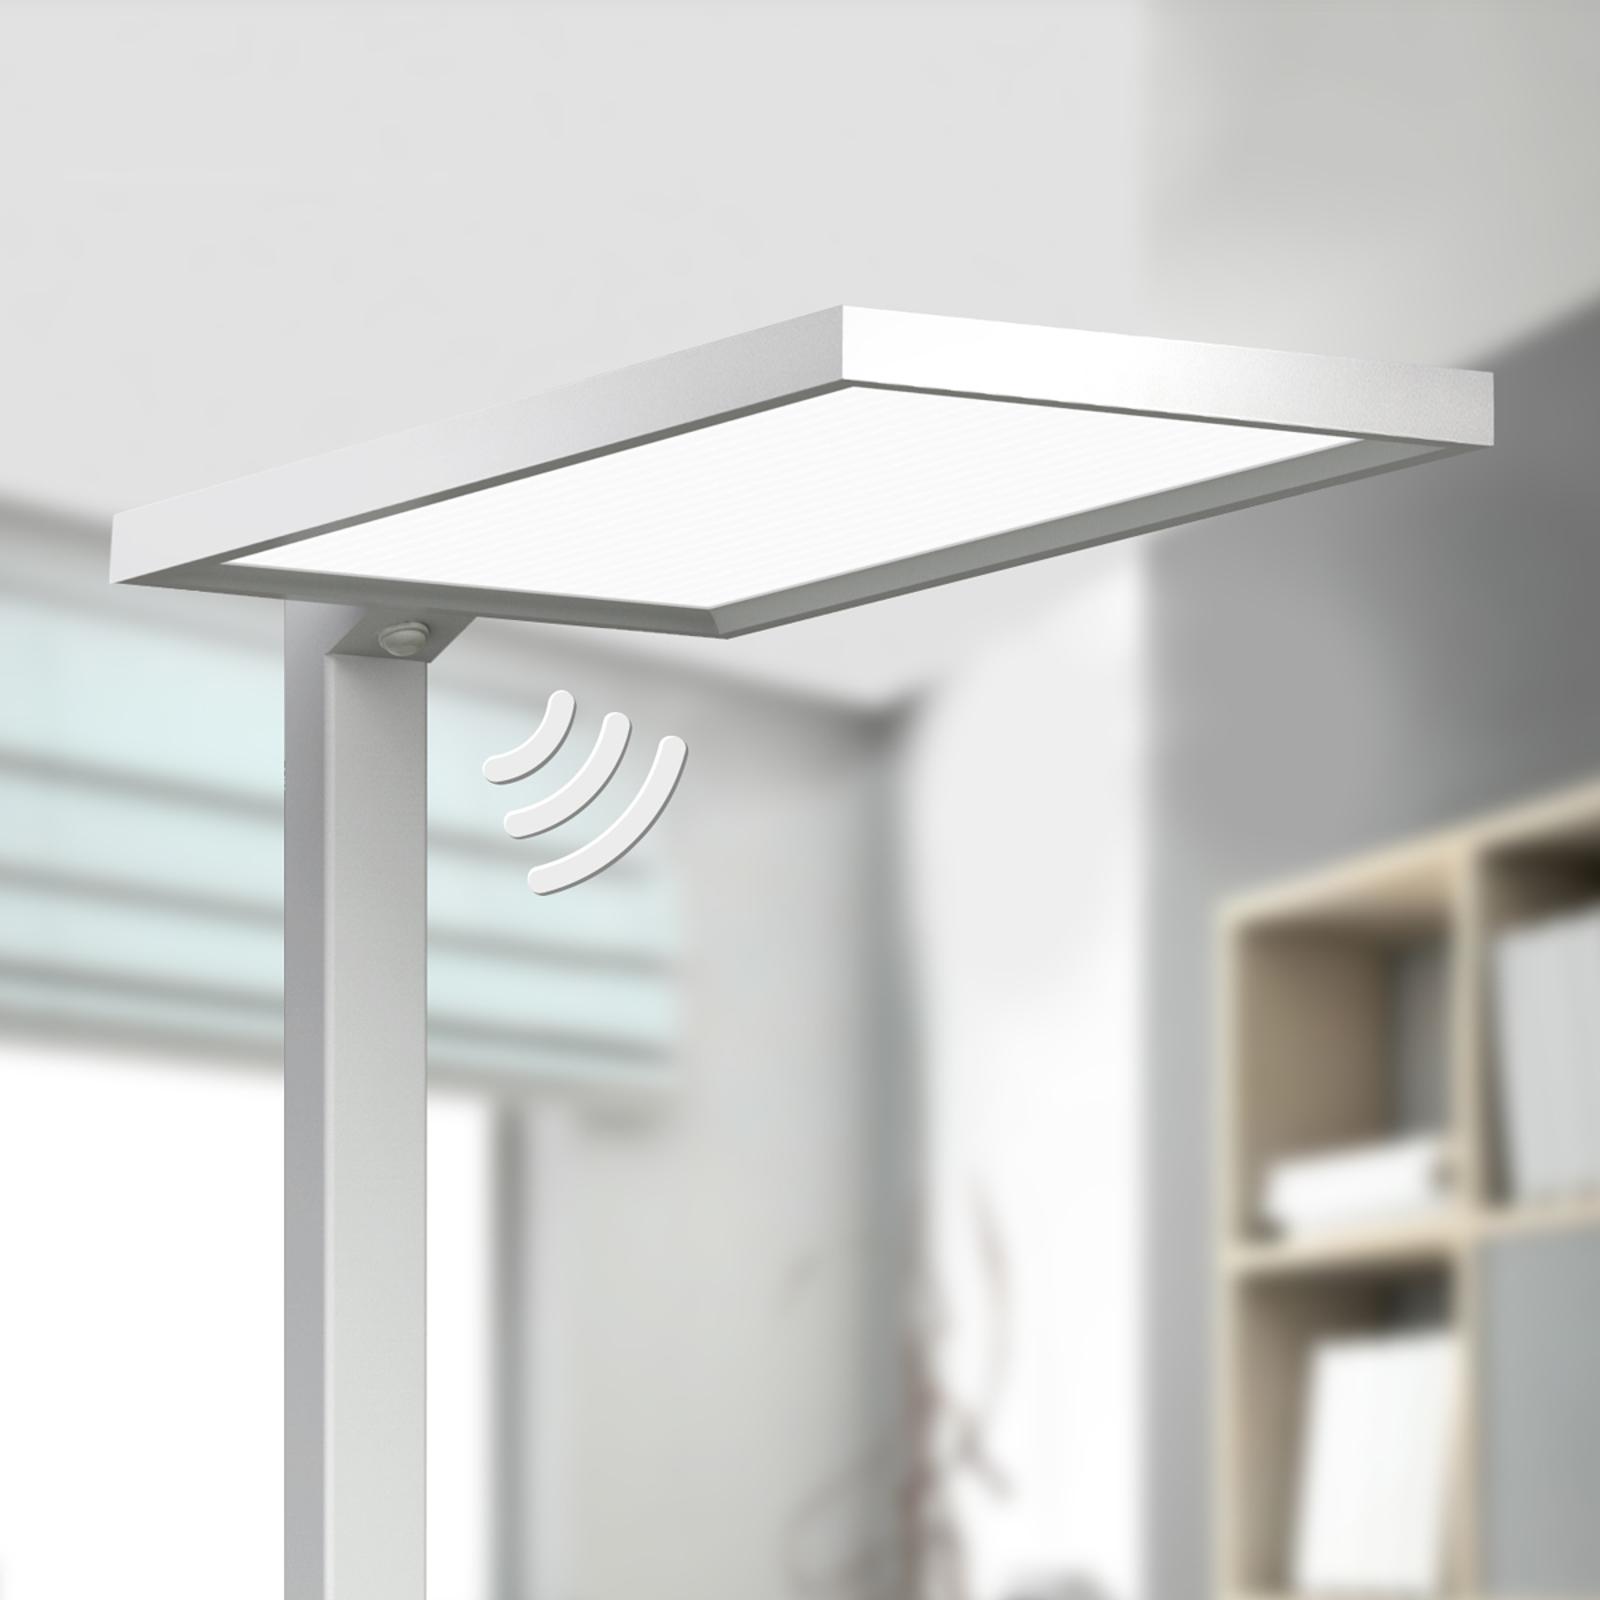 Silver LED office floor lamp Dorean_9968001_1